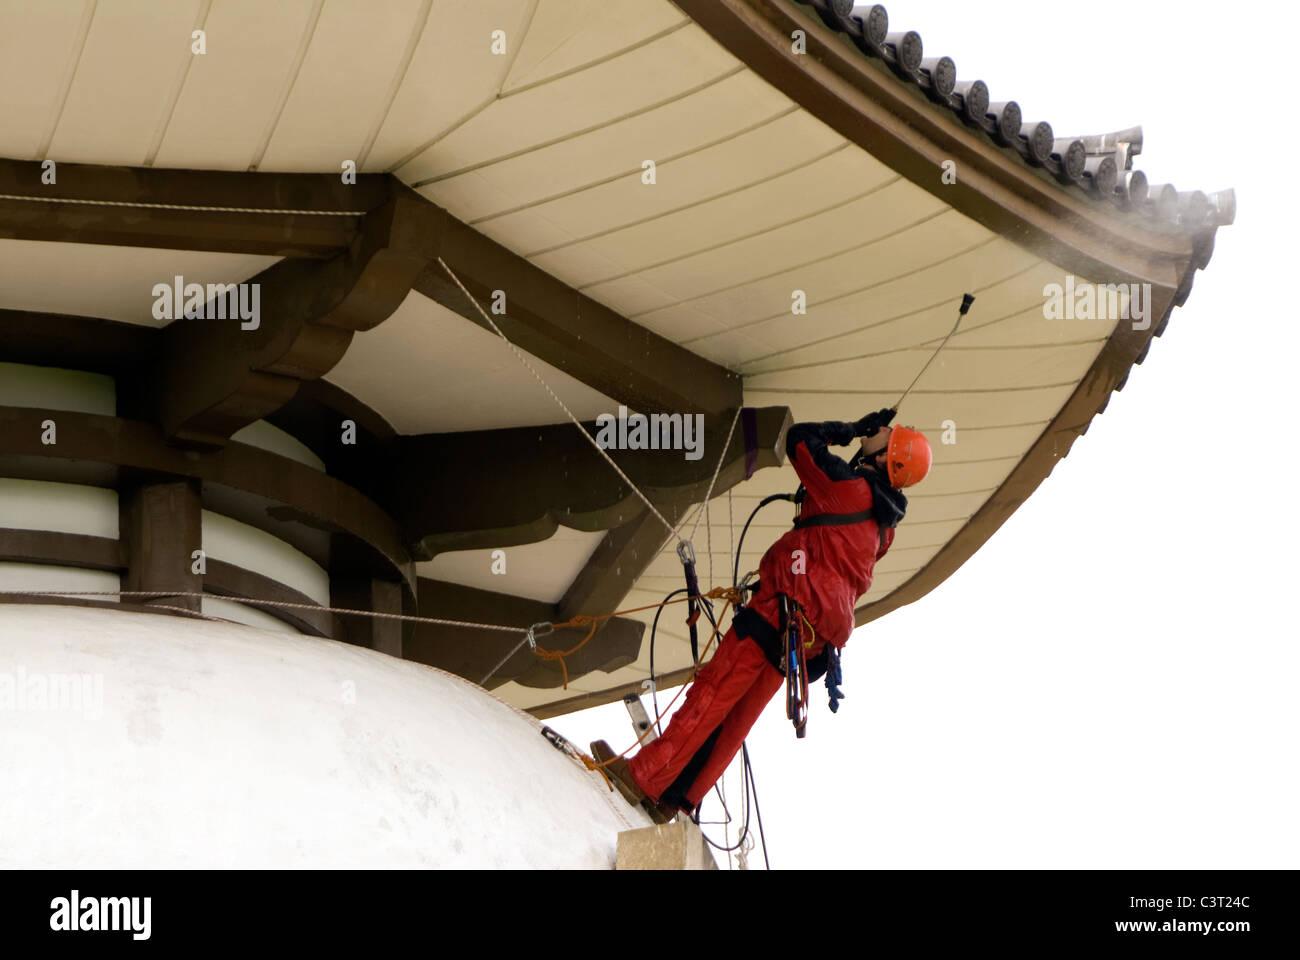 Doug Blane Extreme Cleaning Milton Keynes Peace Pagoda using IRATA Rope Access Techniques - Stock Image